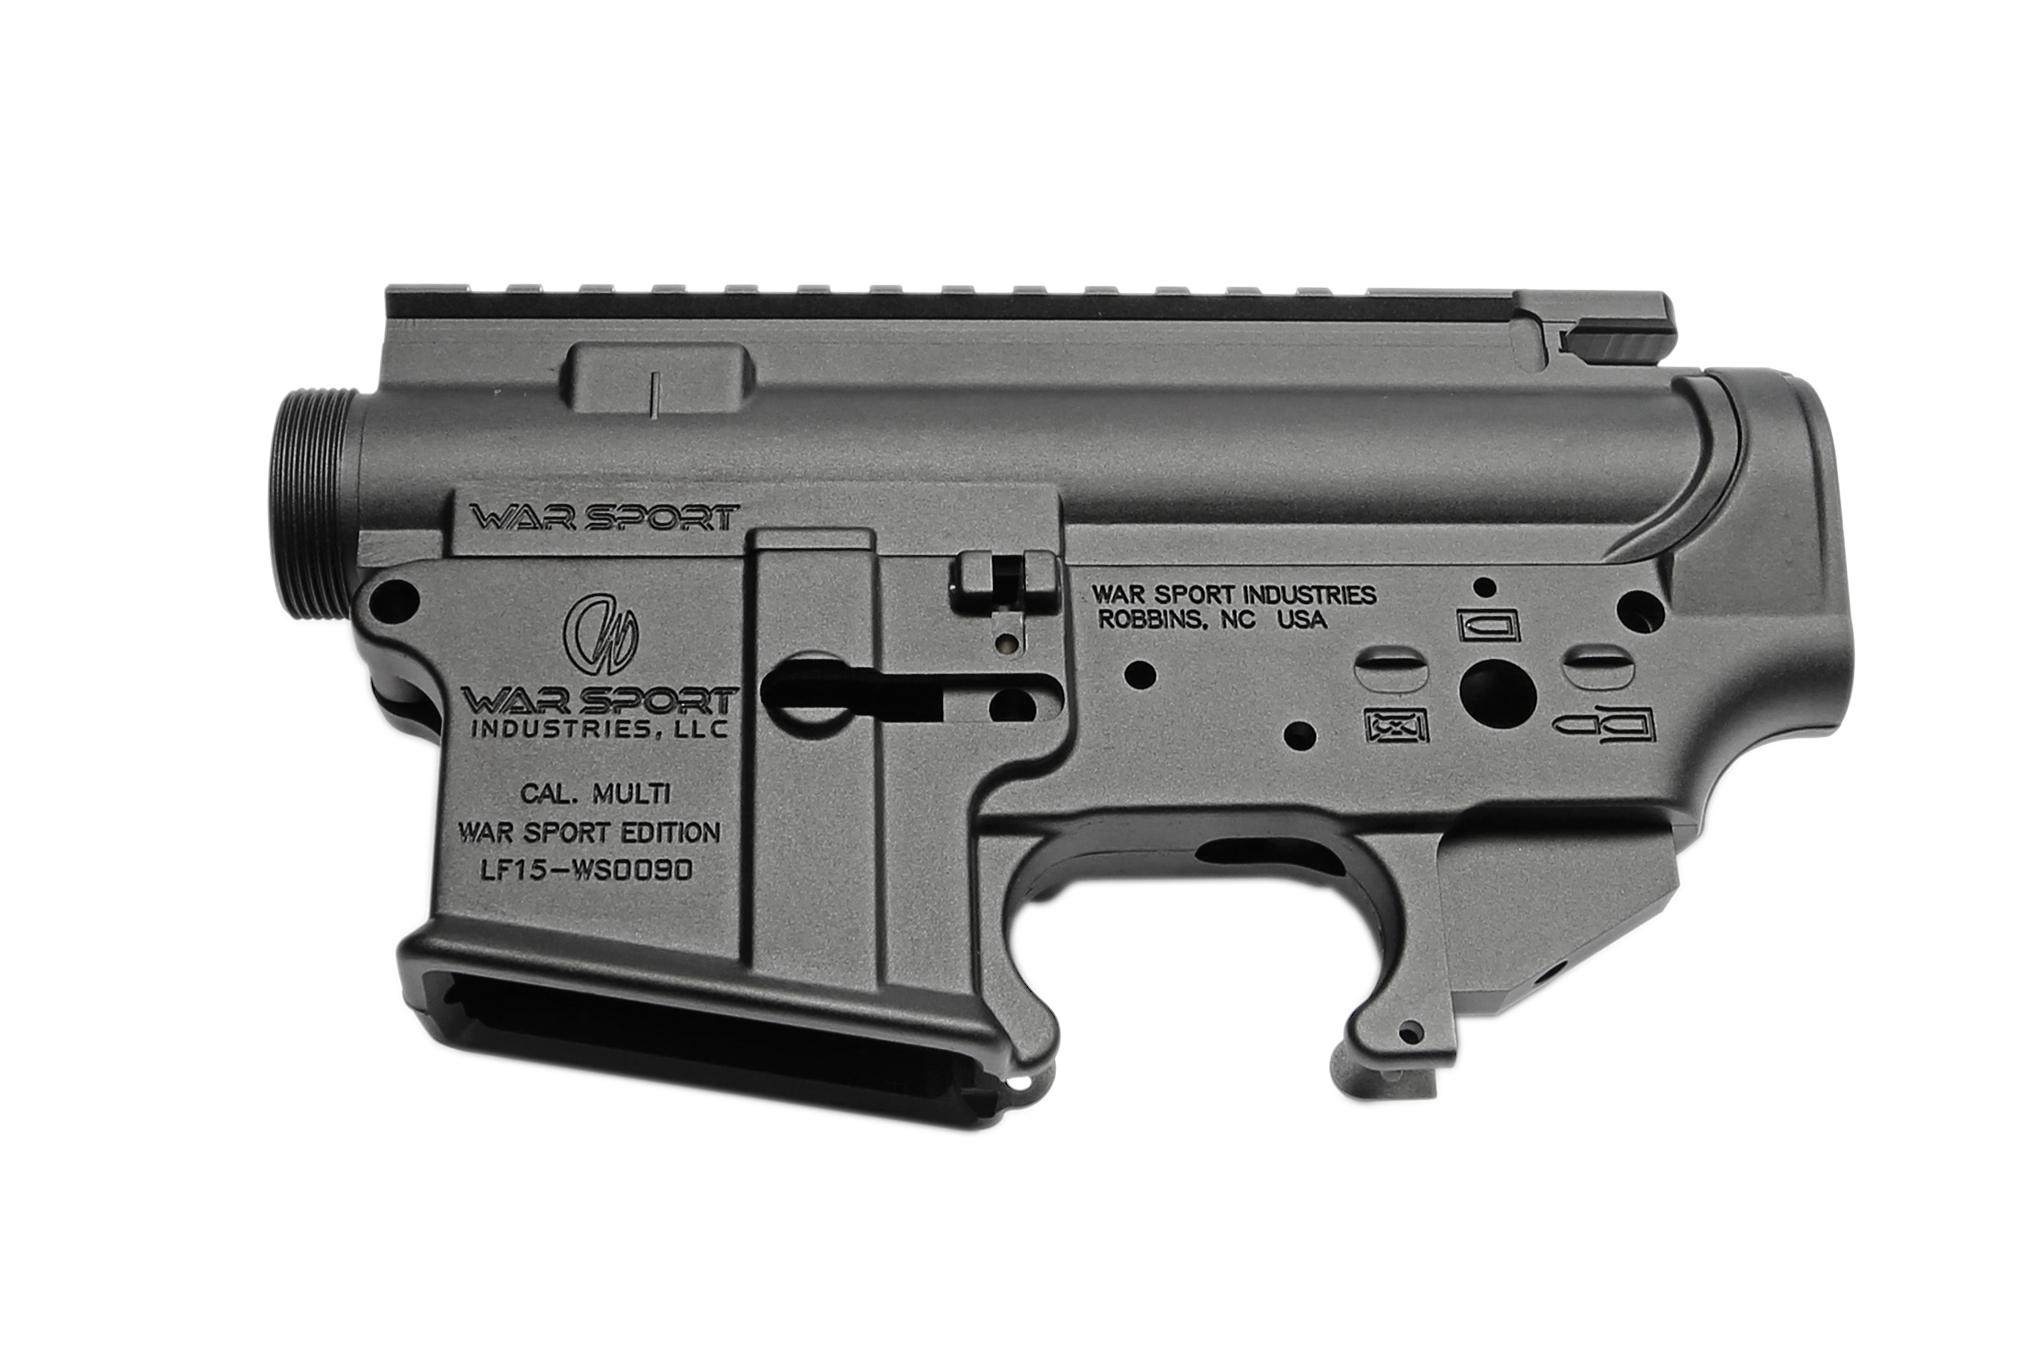 RA-TECH 鍛造 7075アルミレシーバーセット GHK M4 GBB用(WAR SPORT LVOA Ver.)(RAG-GHK--027)